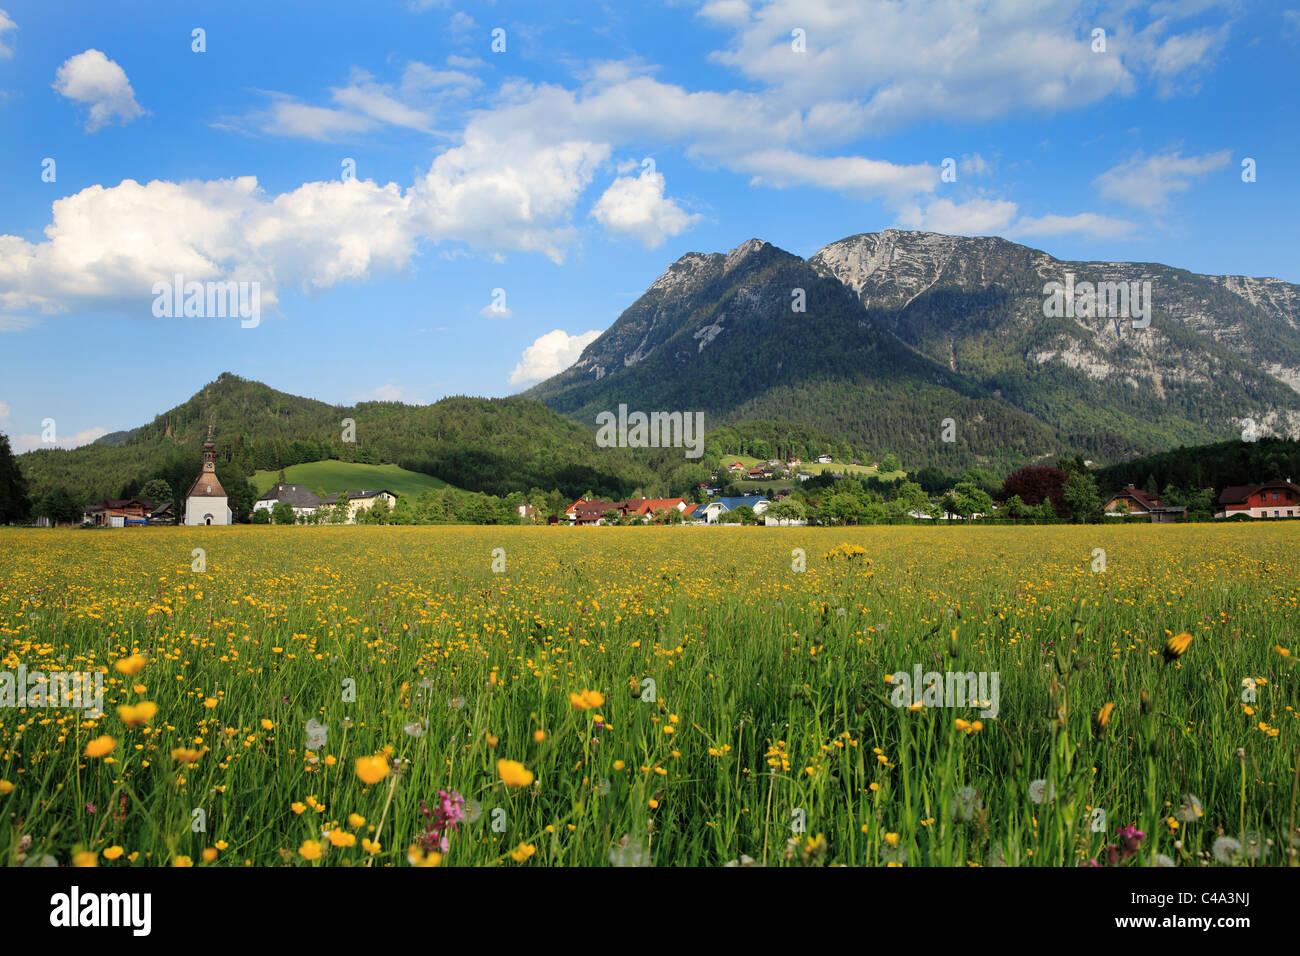 The church of St Agatha at the village of the same name near Bad Goisern in Austria. Hoher Sarstein mountain lies - Stock Image